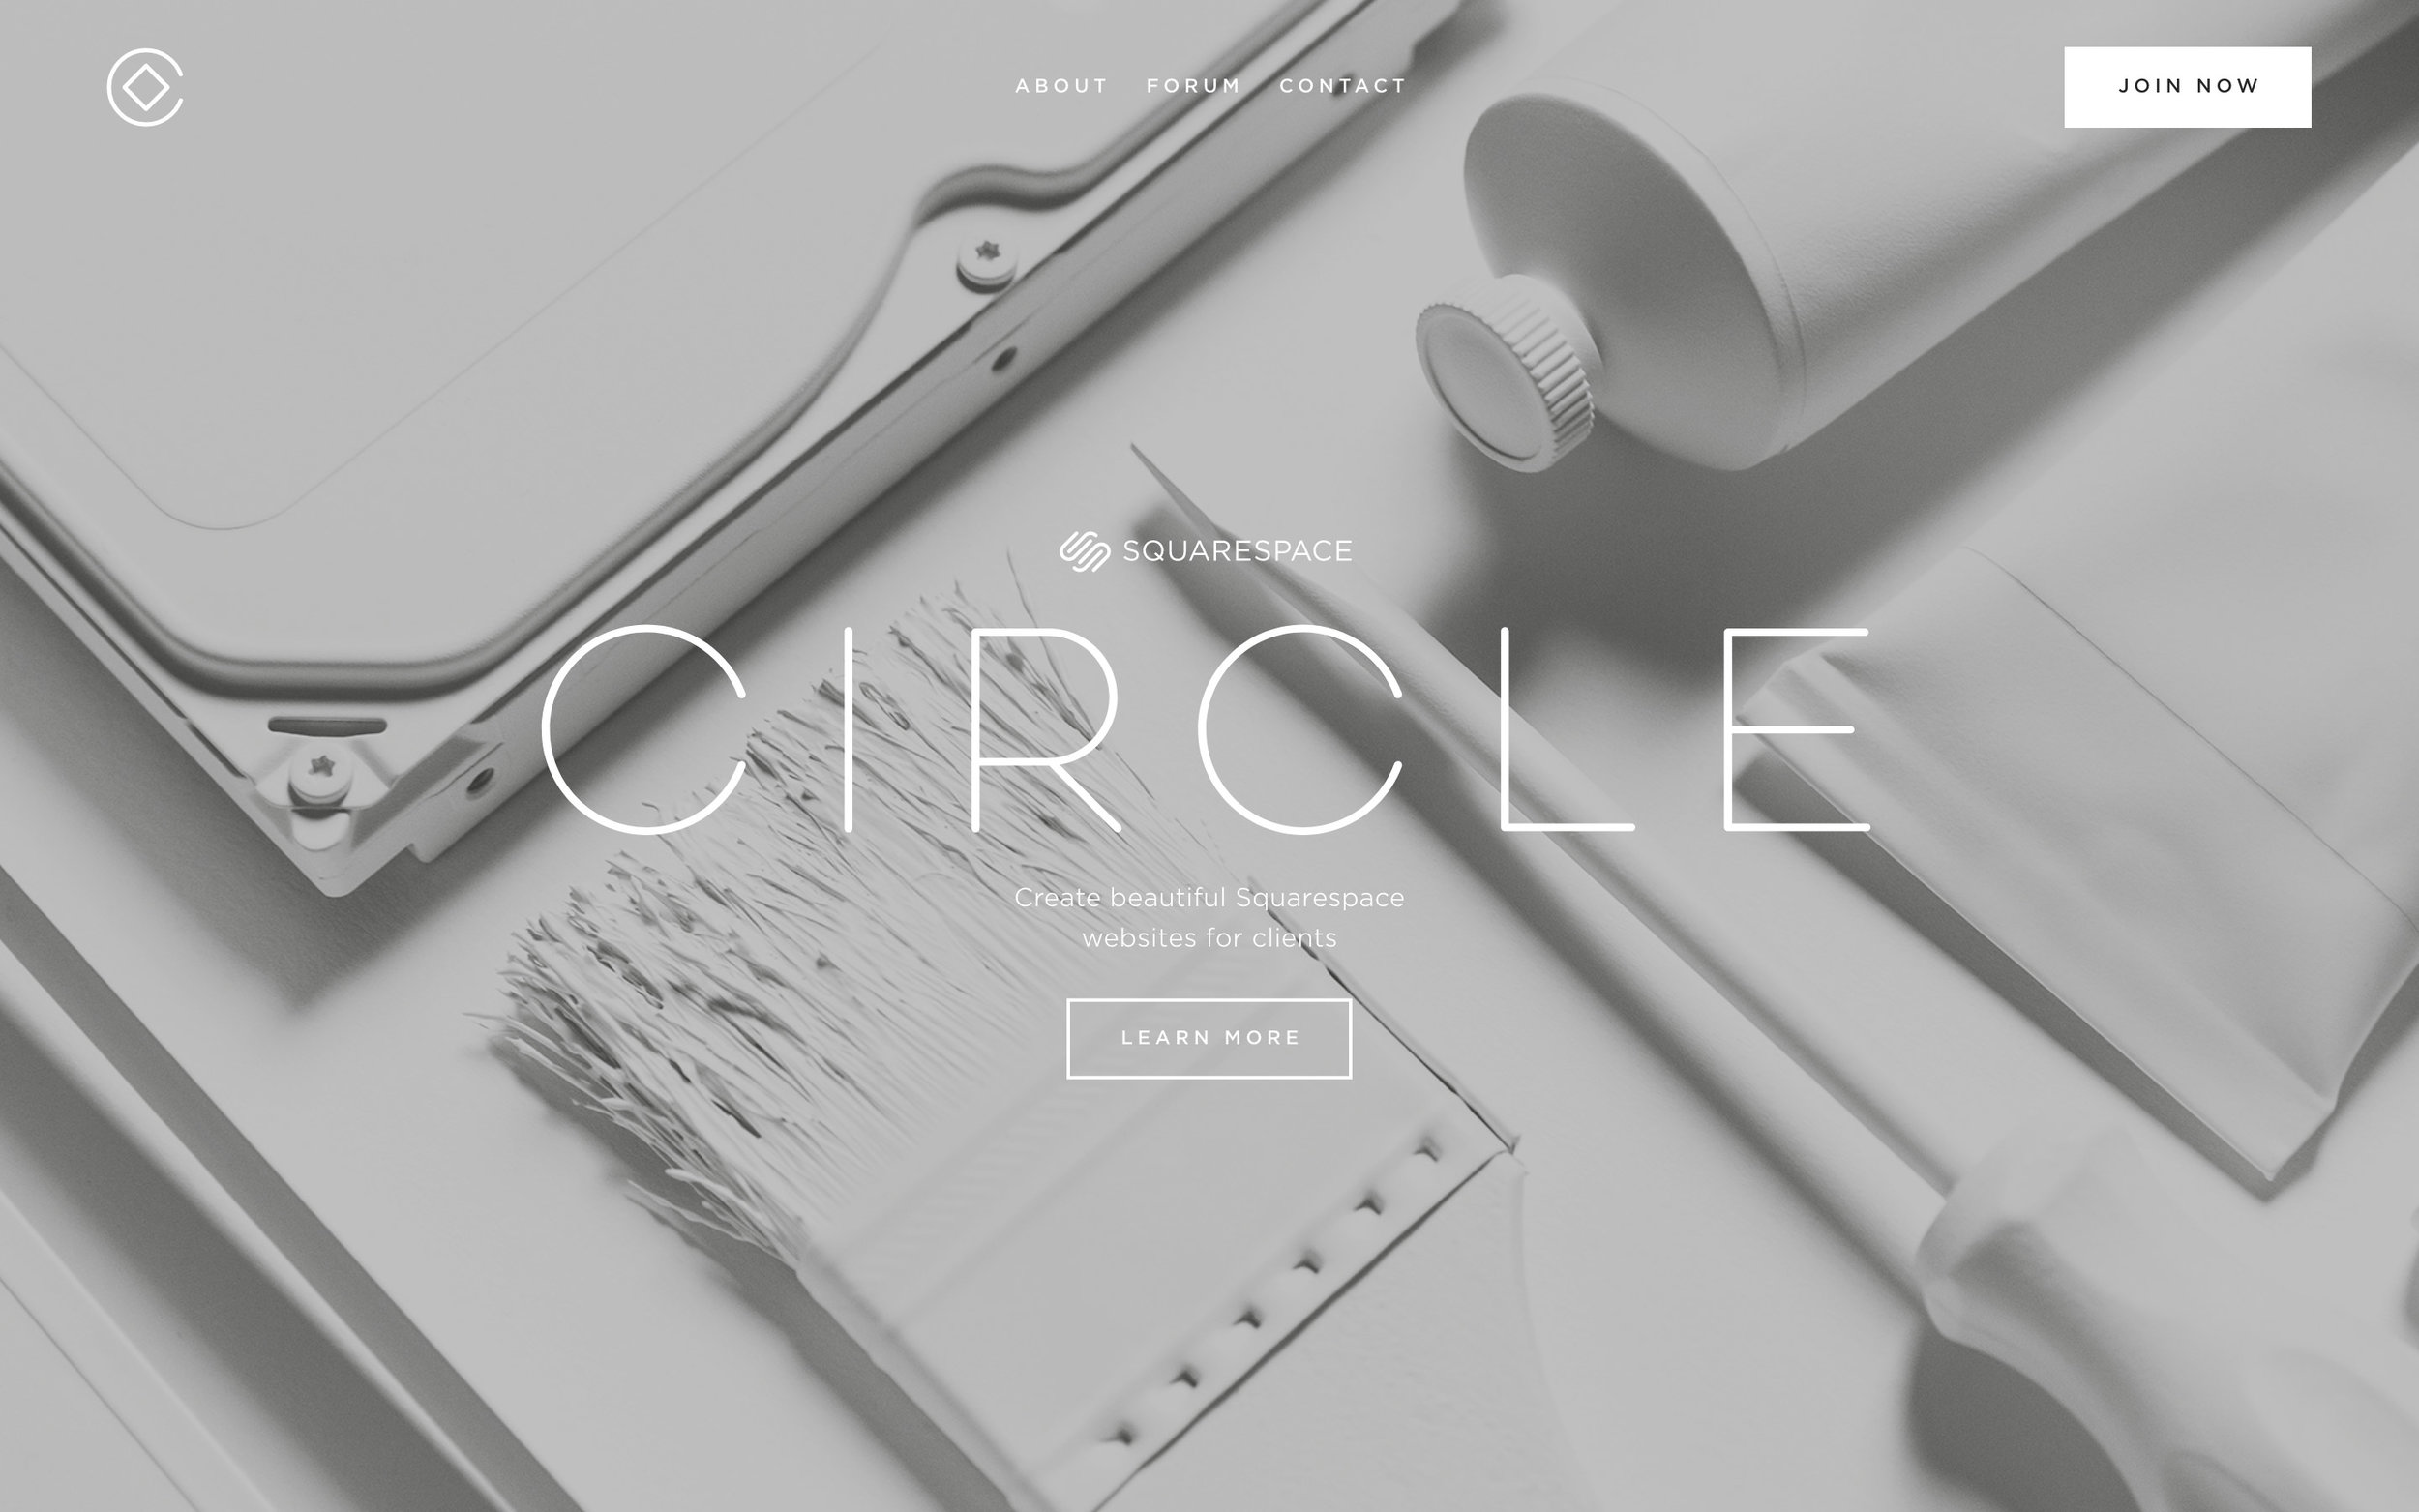 circle-website-01.jpg